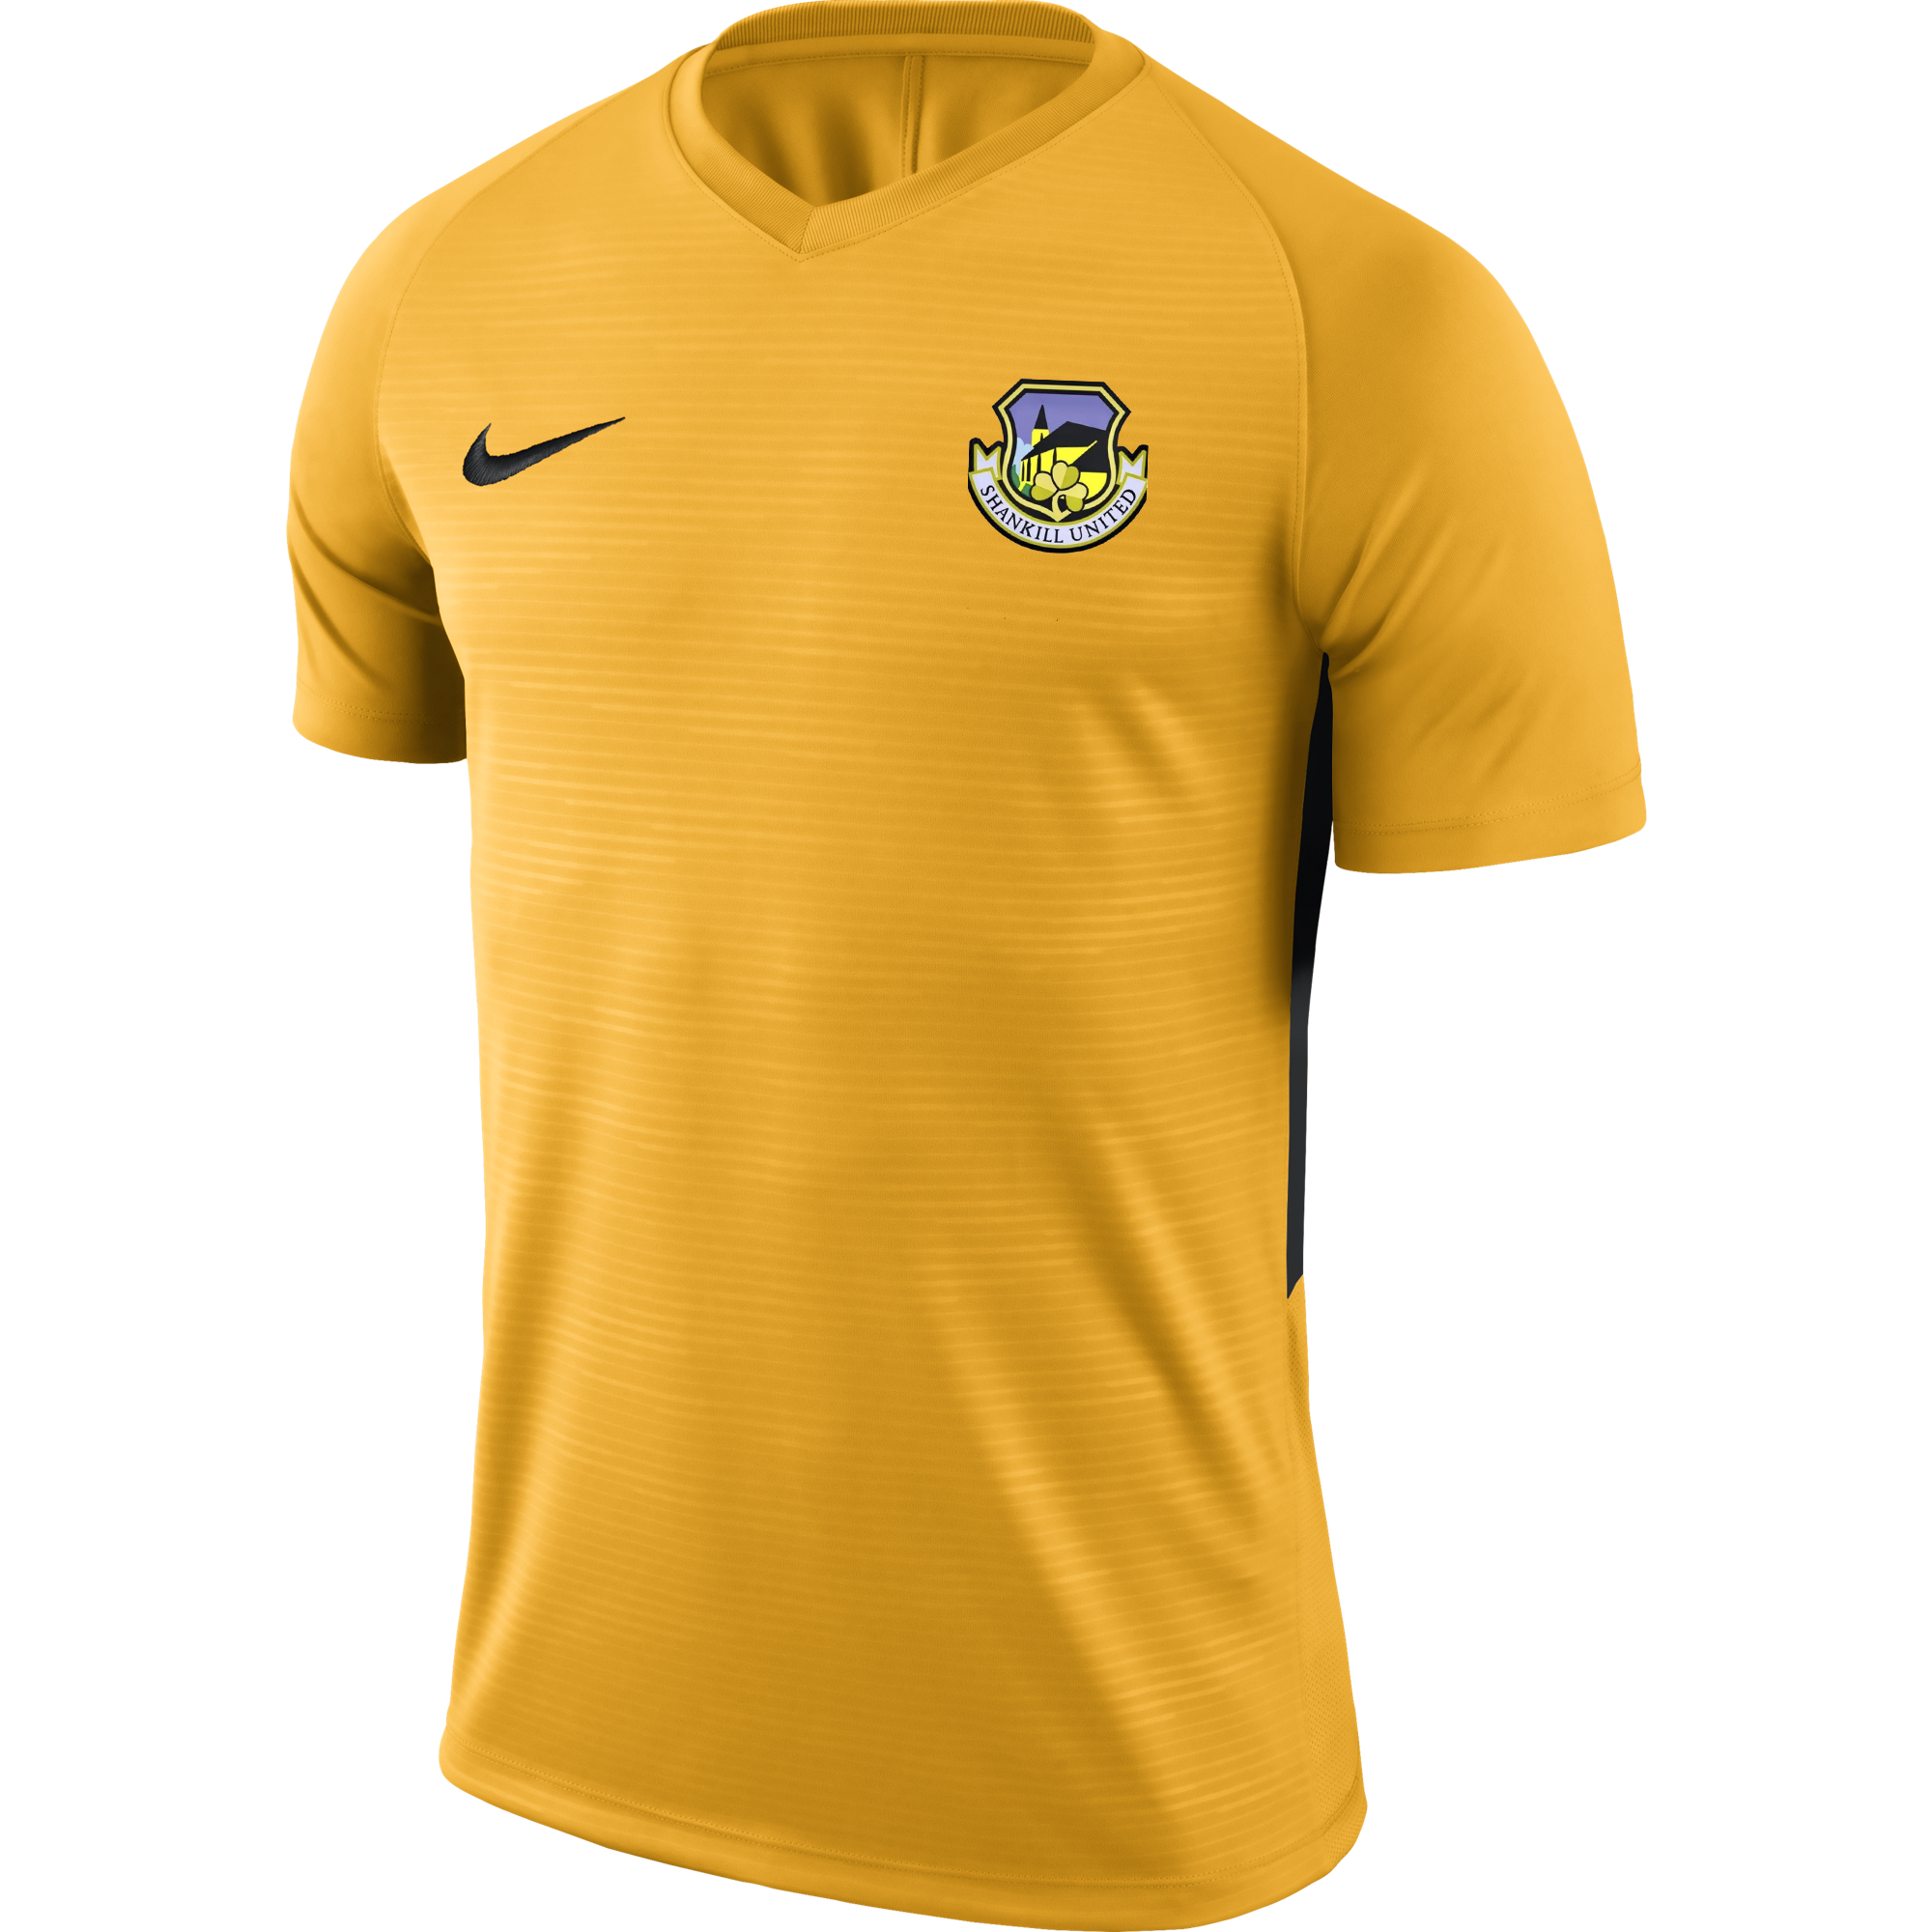 shankill utd match jersey youth  37377 1 p